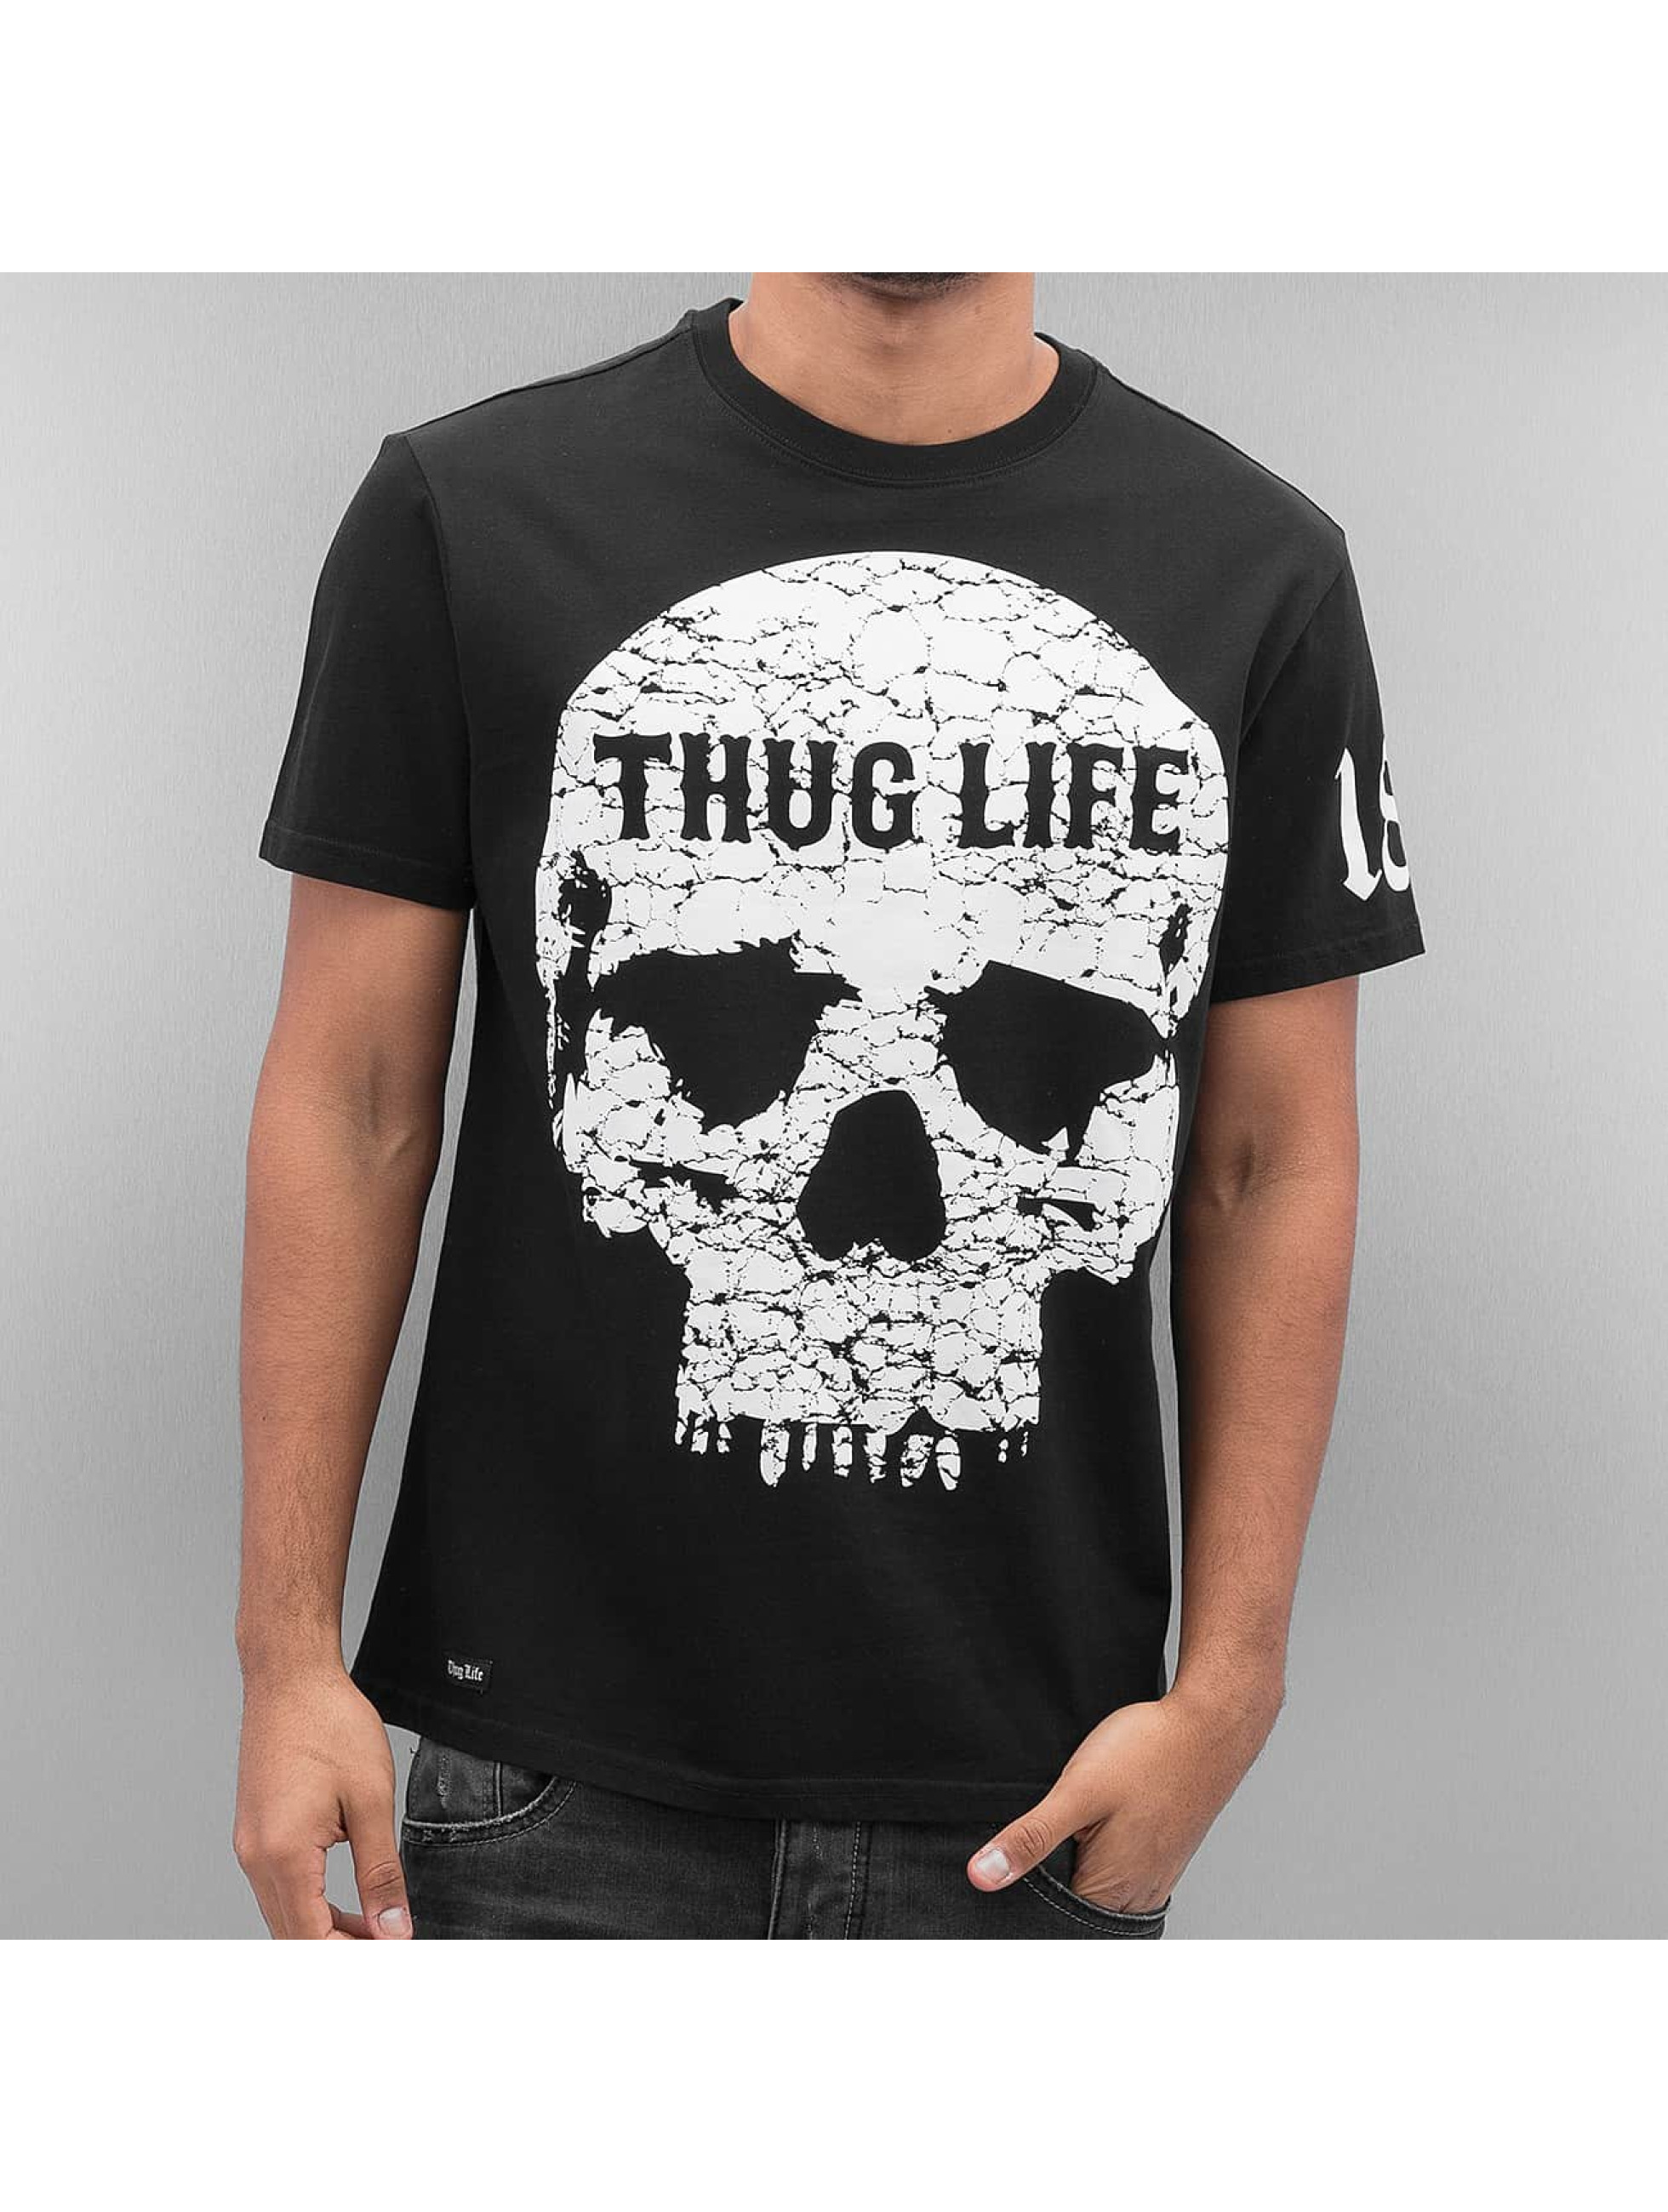 Thug Life Thugstyle T-Shirt Black Sale Angebote Döbern